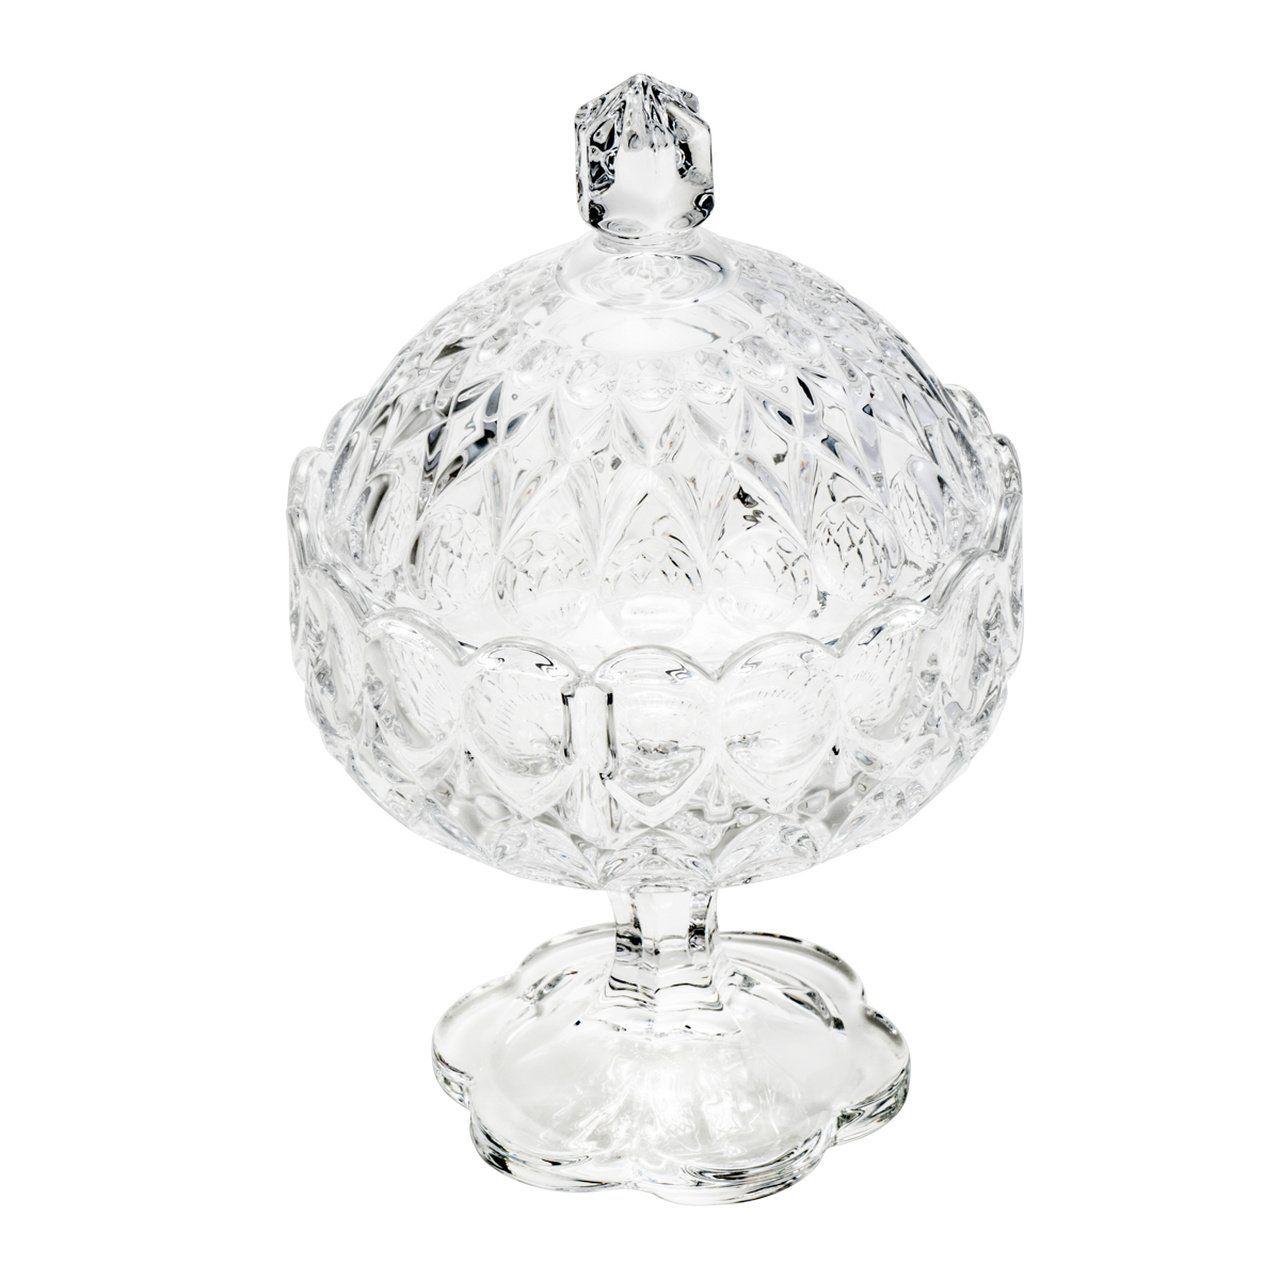 Bomboniere 23 cm de cristal transparente com tampa e pé Angélica Wolff - 25556